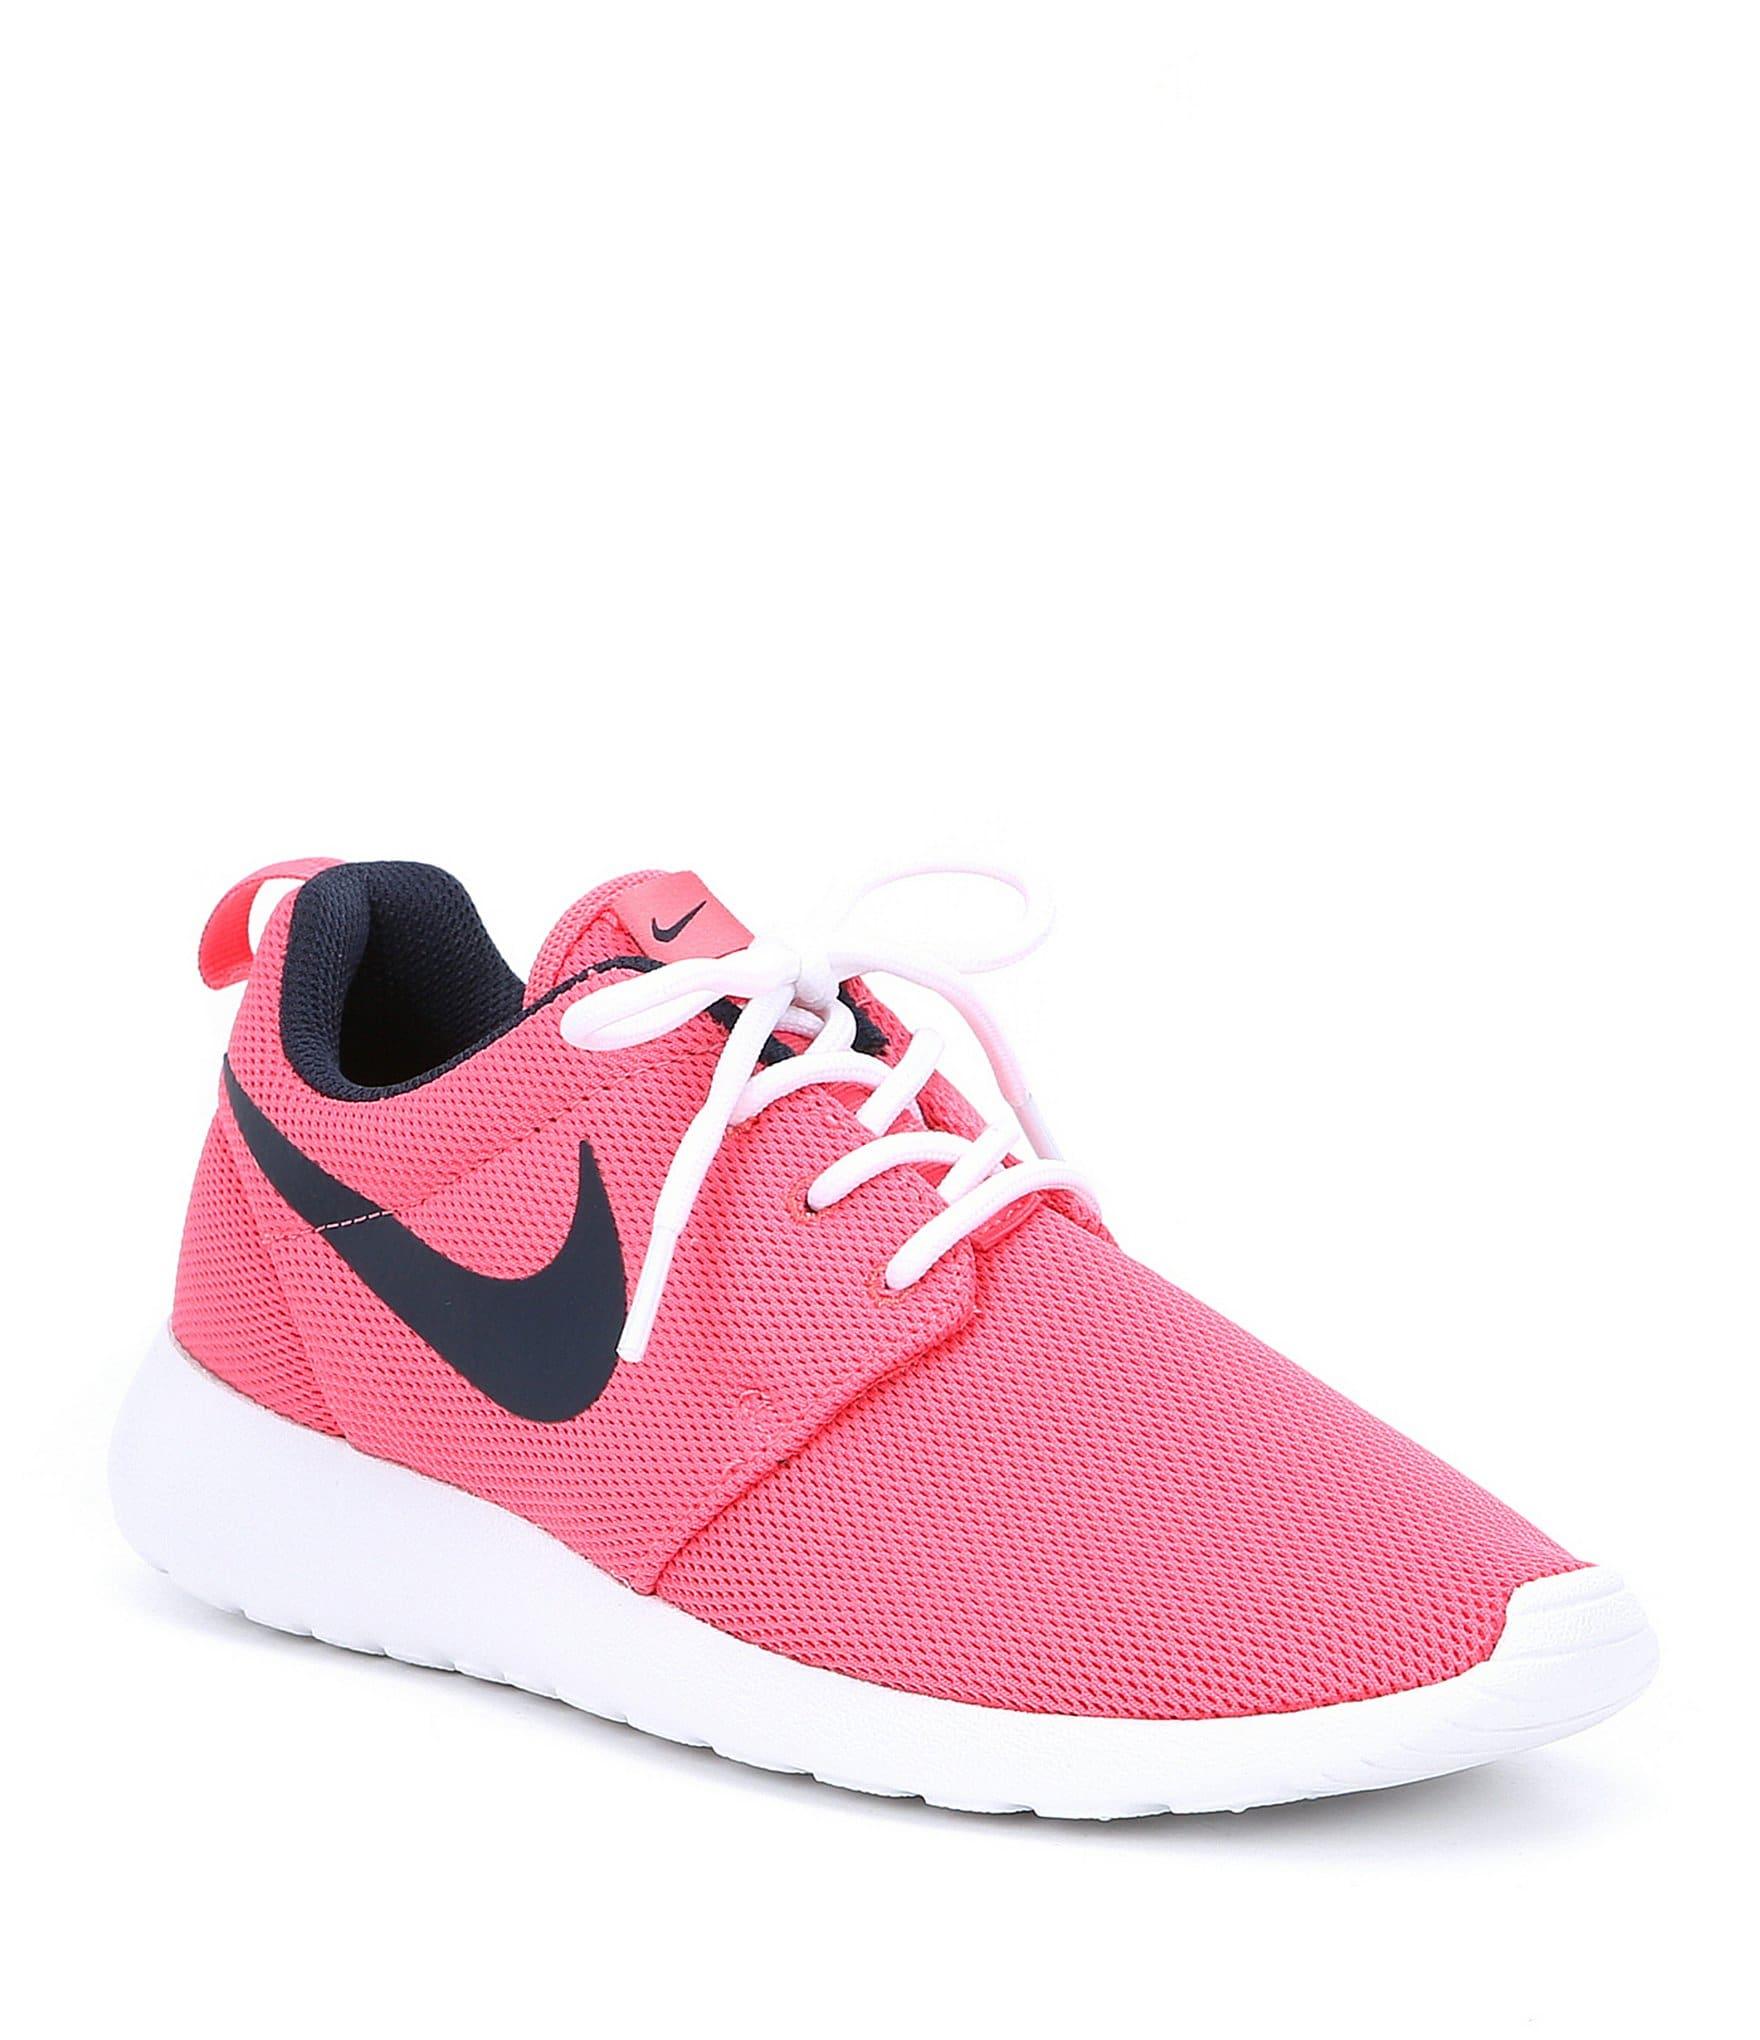 Nike Free 6.0 Frauen | OIS Group